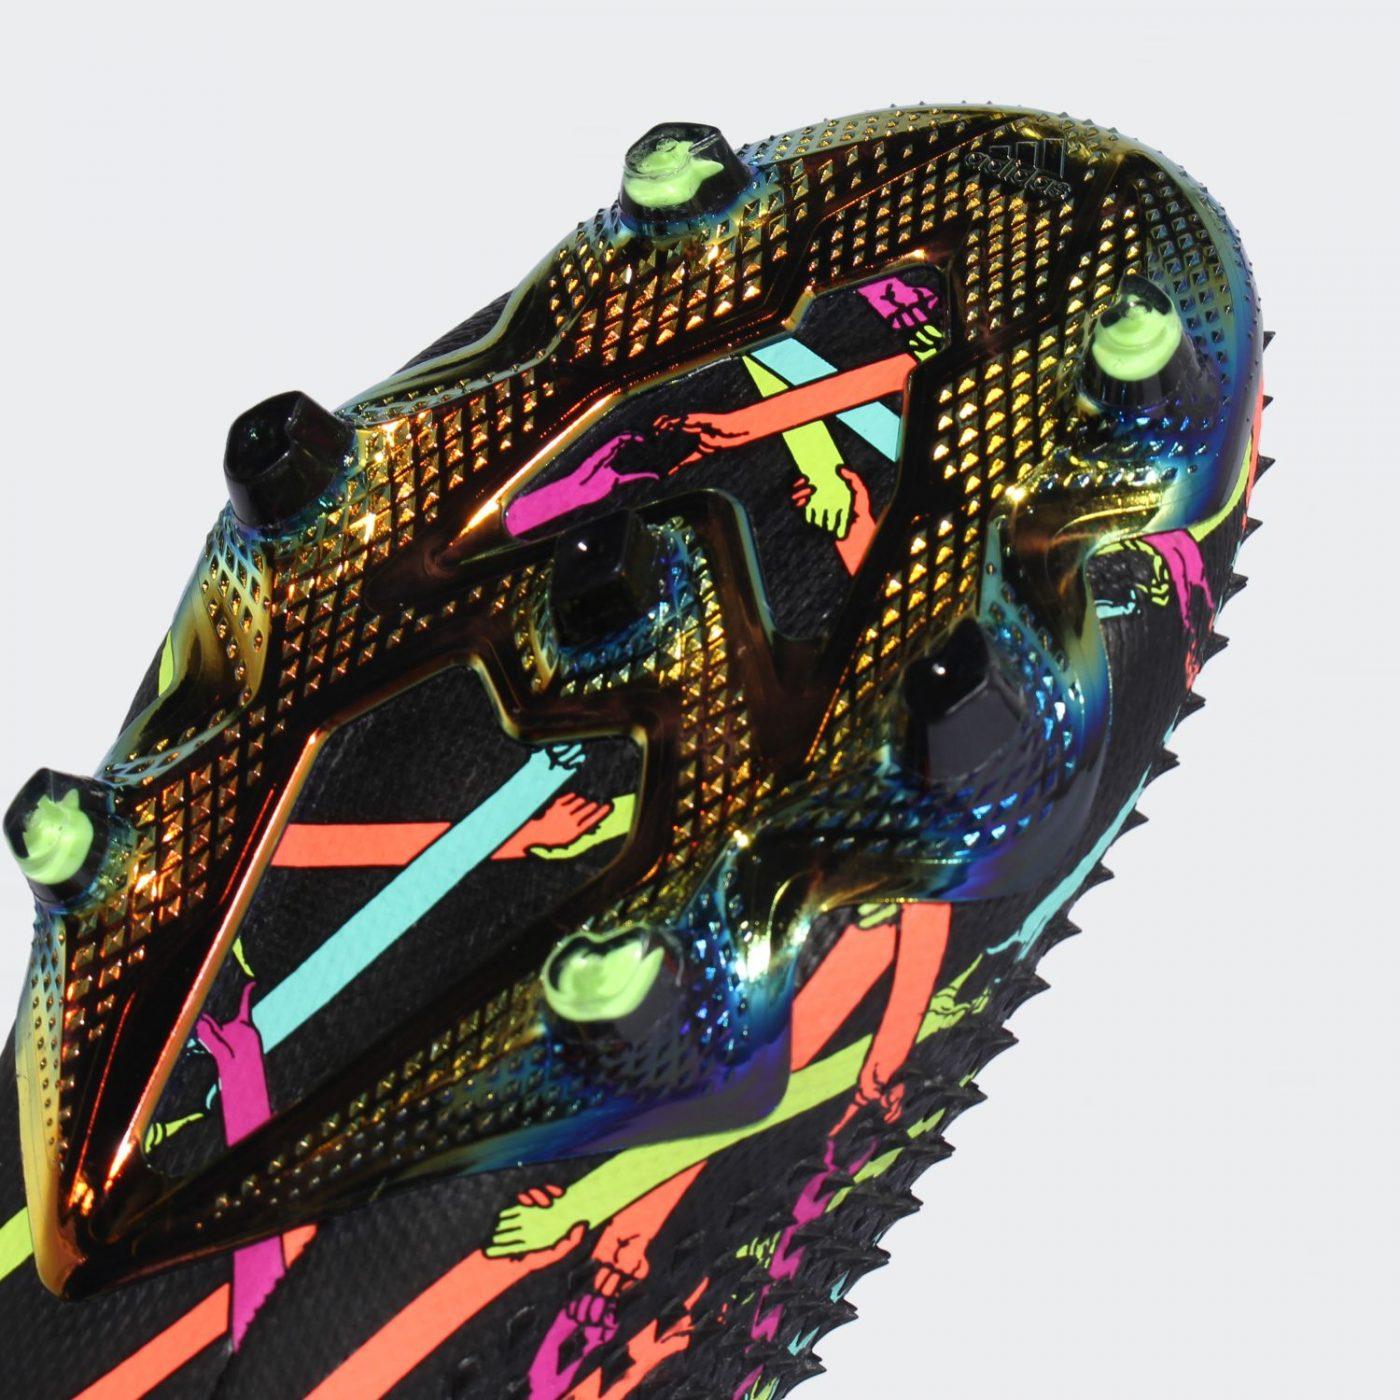 adidas-predator-20-mutator-art-firm-japon-6